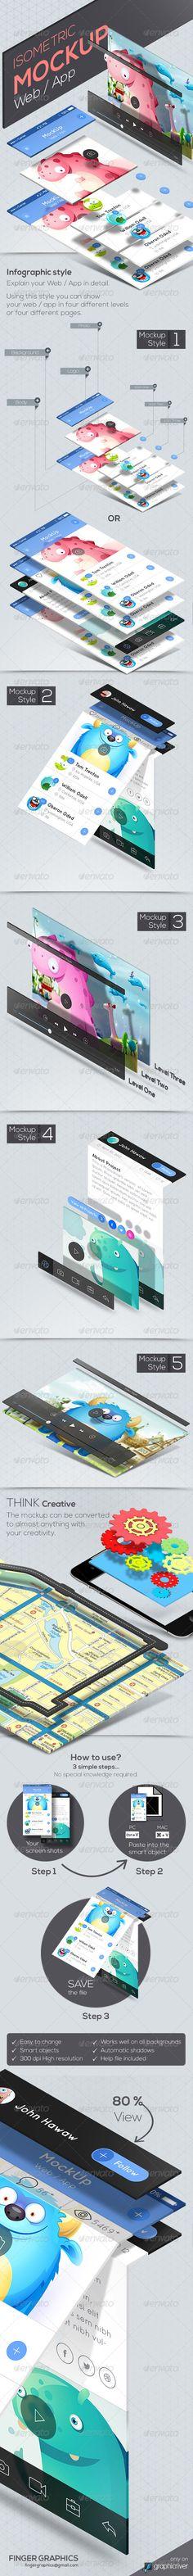 Isometric Web / App Mockup - Product Mock-Ups Graphics